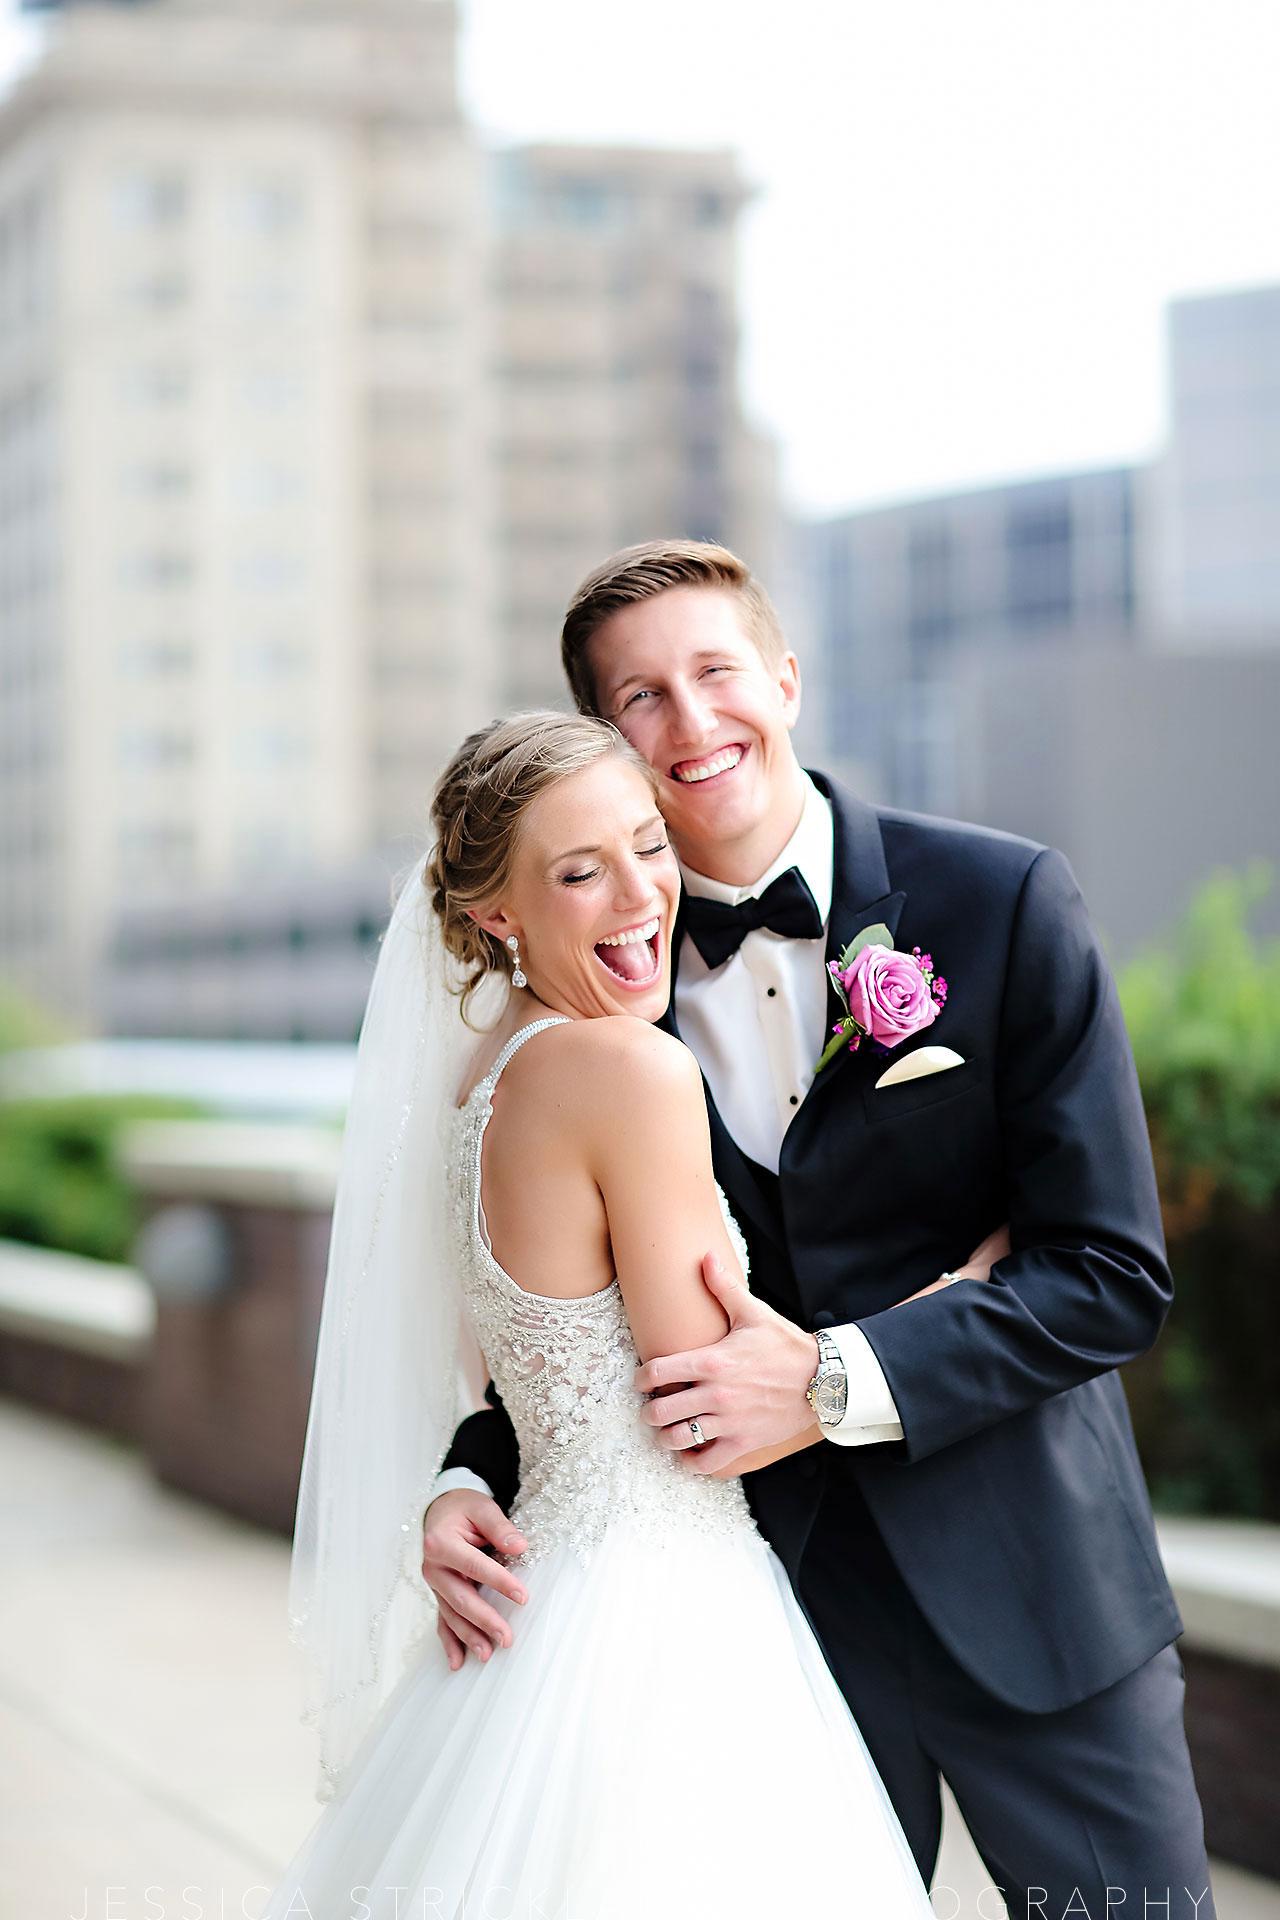 Serra Alex Regions Tower Indianapolis Wedding 227 watermarked